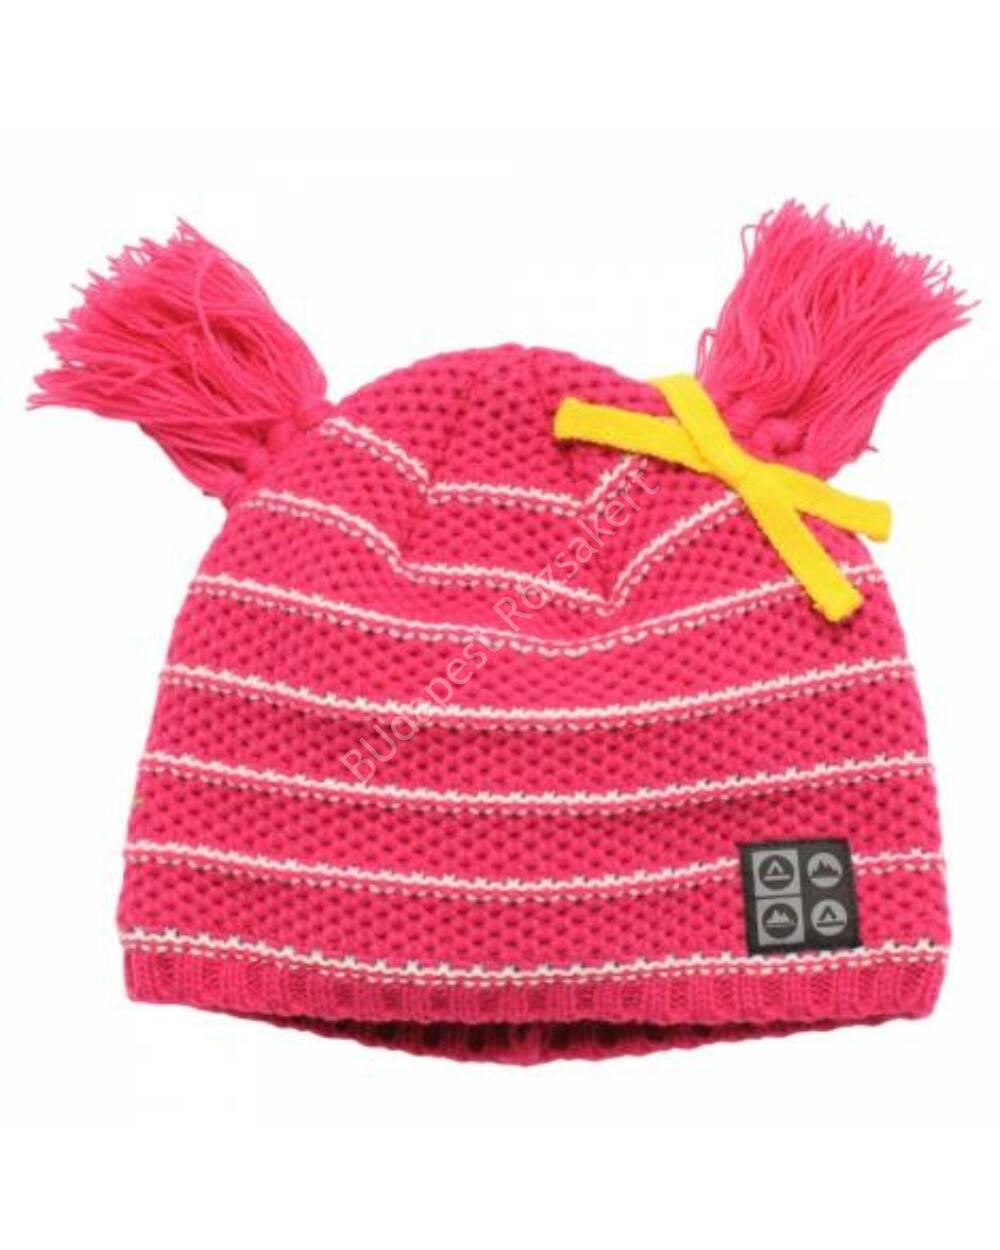 Dare2b Precede beanie gyermek sapka, pink, 1-2 éves